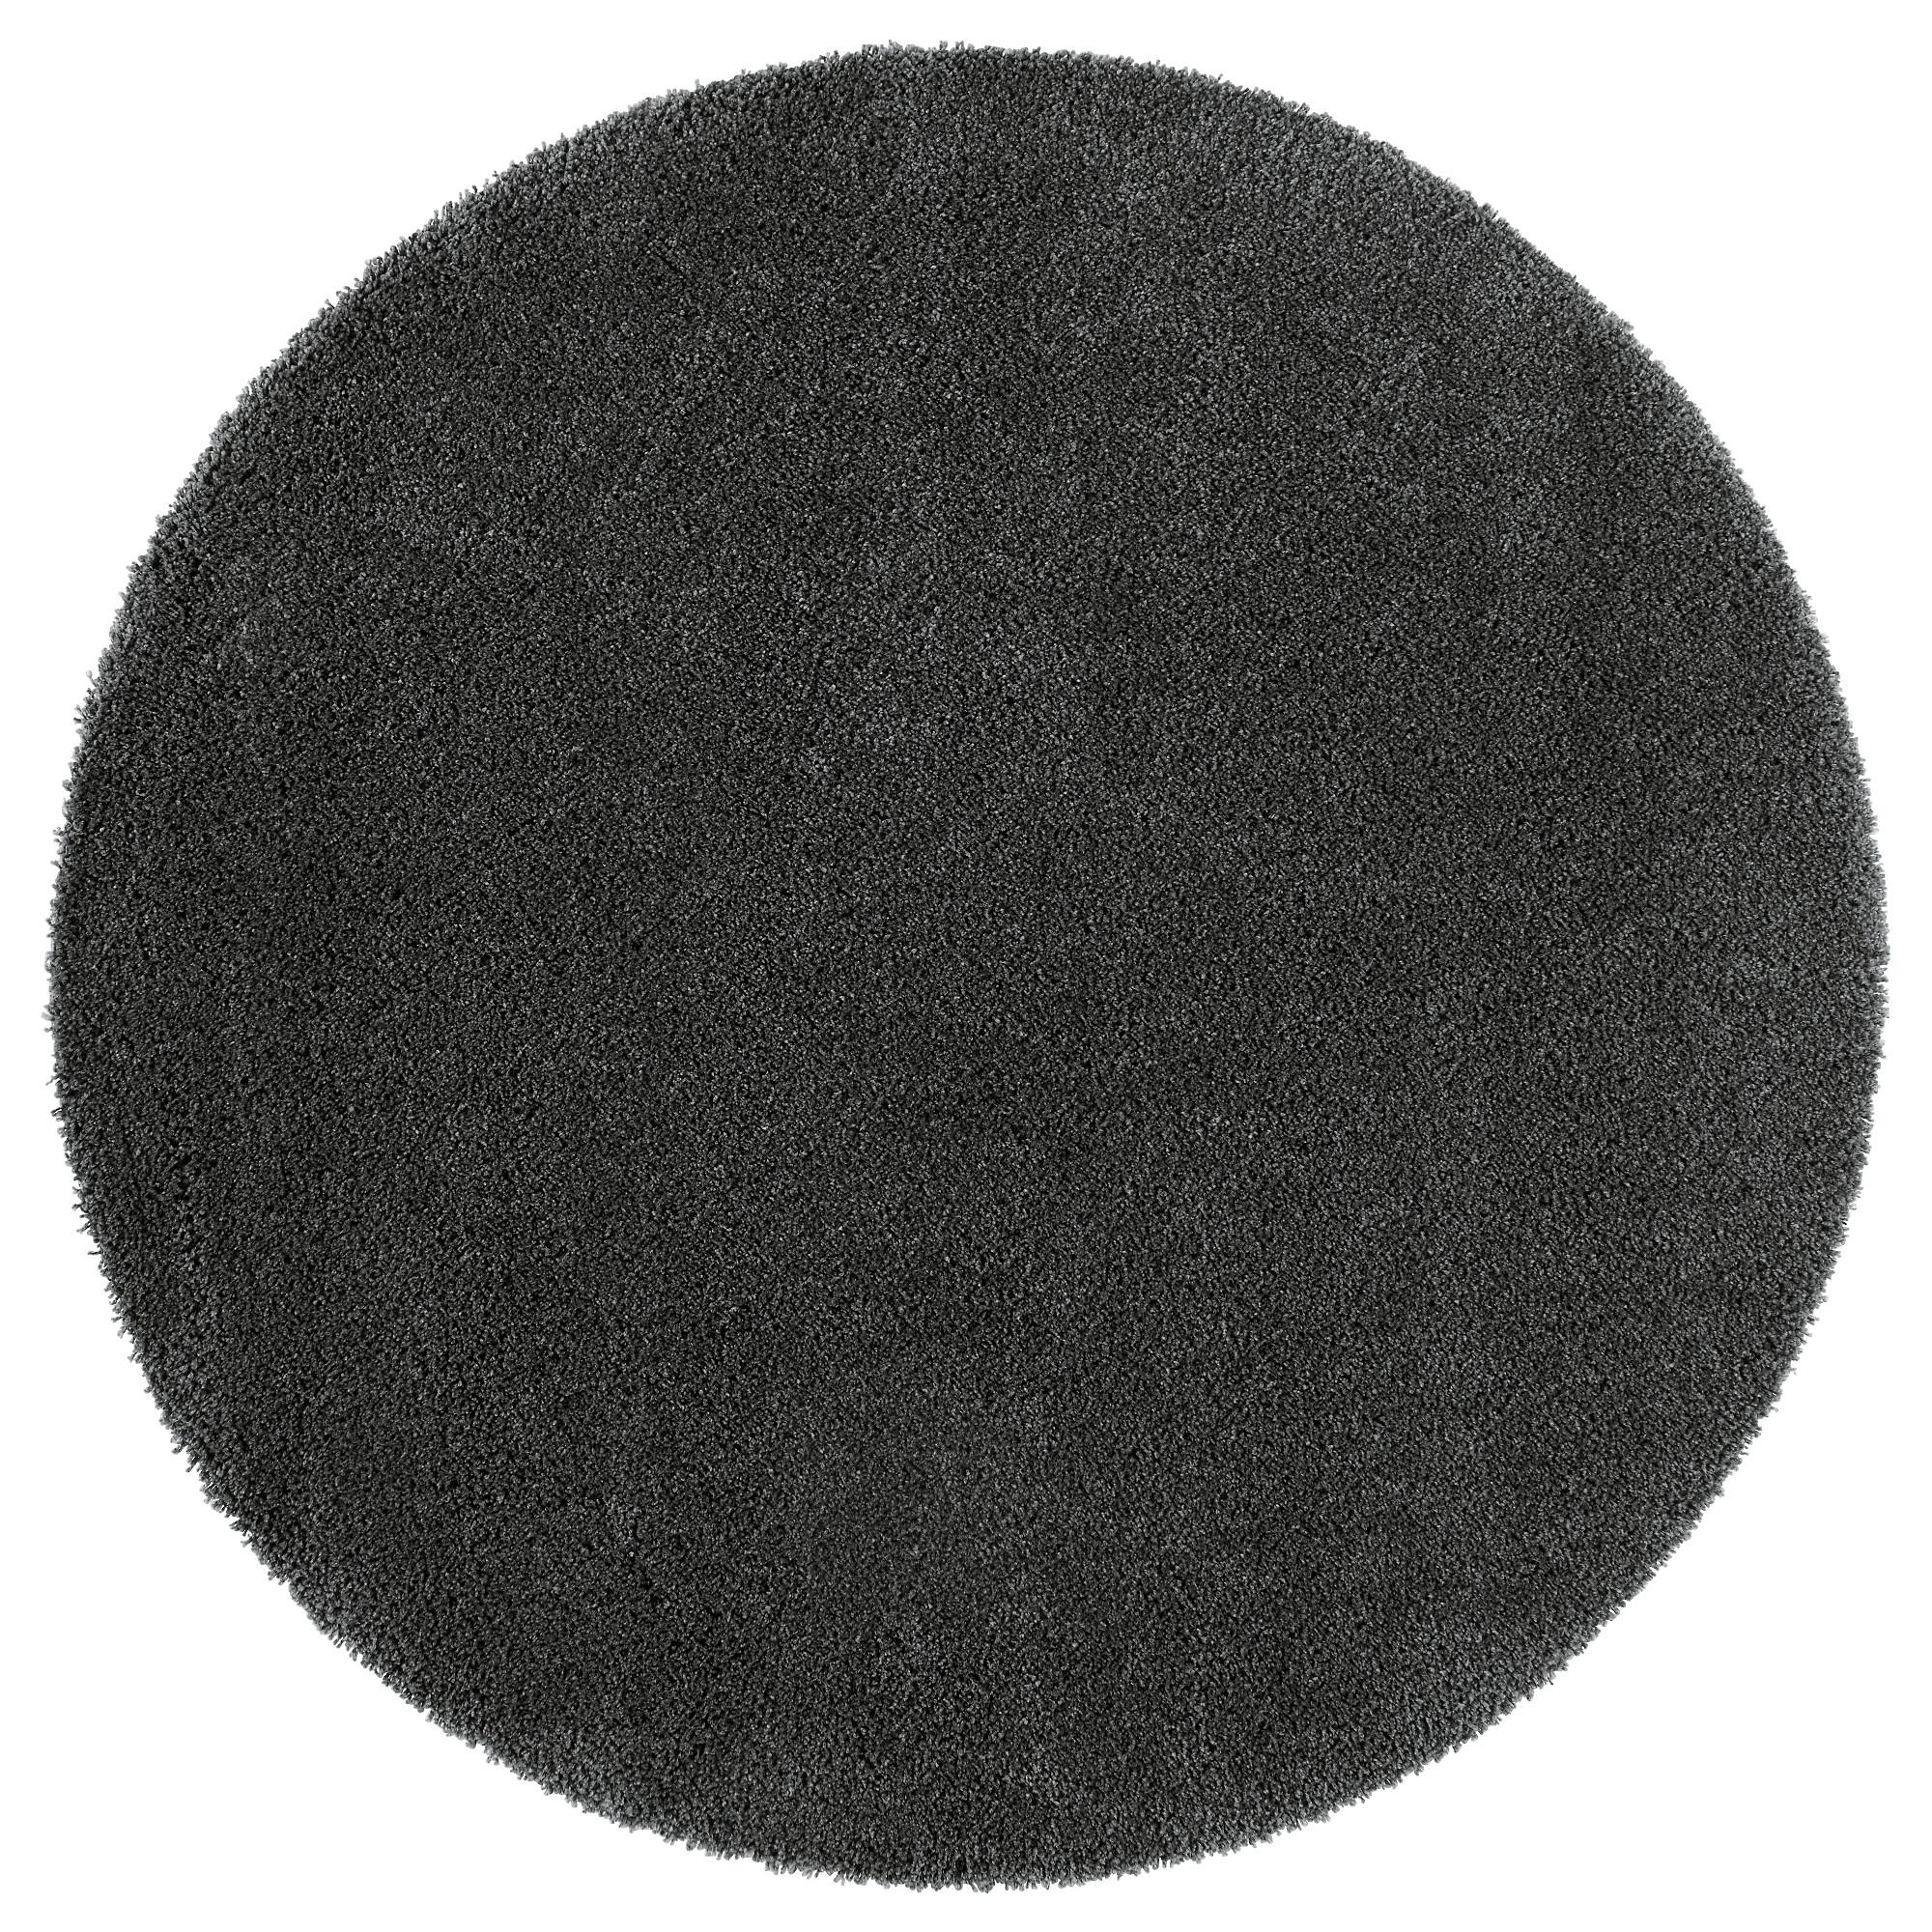 circular rugs photo 3 of 5 ådum rug, high pile, dark gray diameter: 4 u0027 RIKZTLN